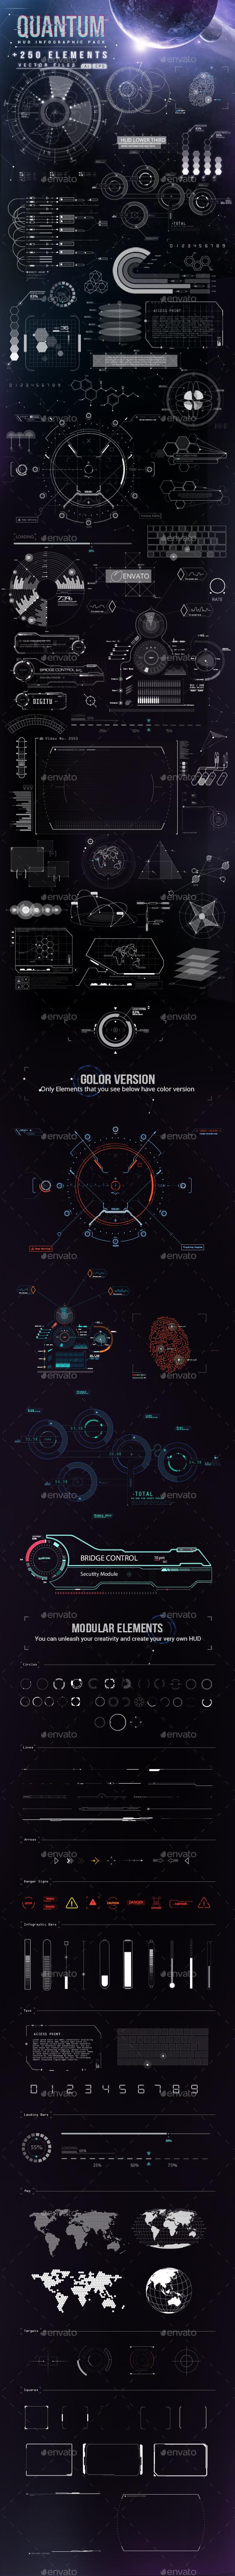 GraphicRiver Quantum HiTech HUD Creator Kit 9020363